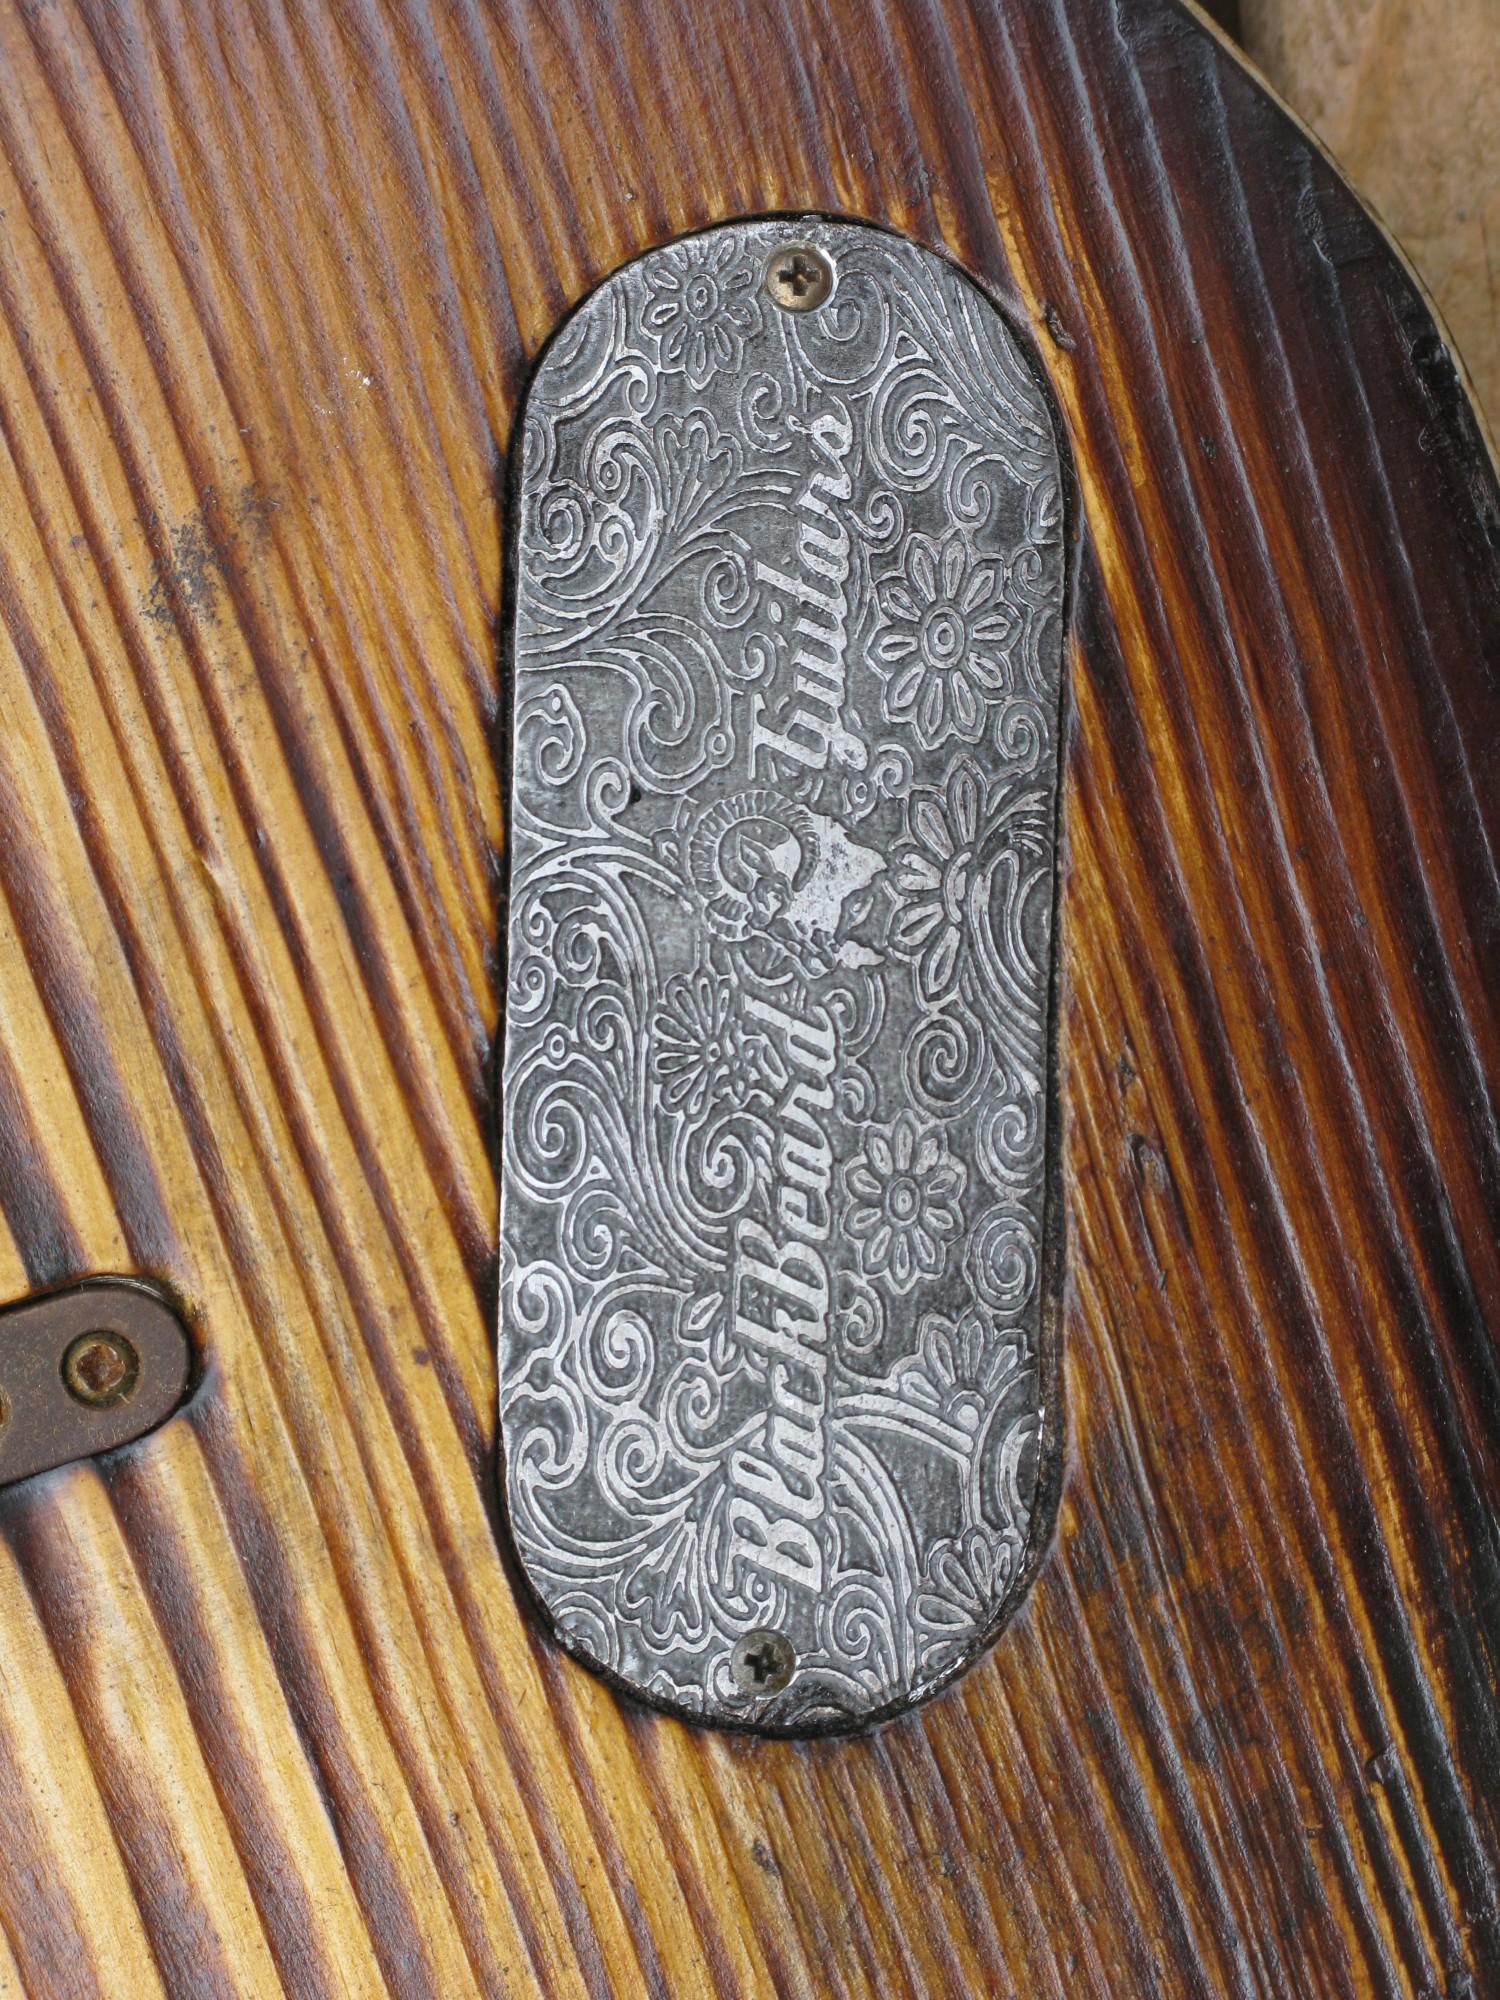 Chitarra modello telecaster 1 pickup piastra incisa